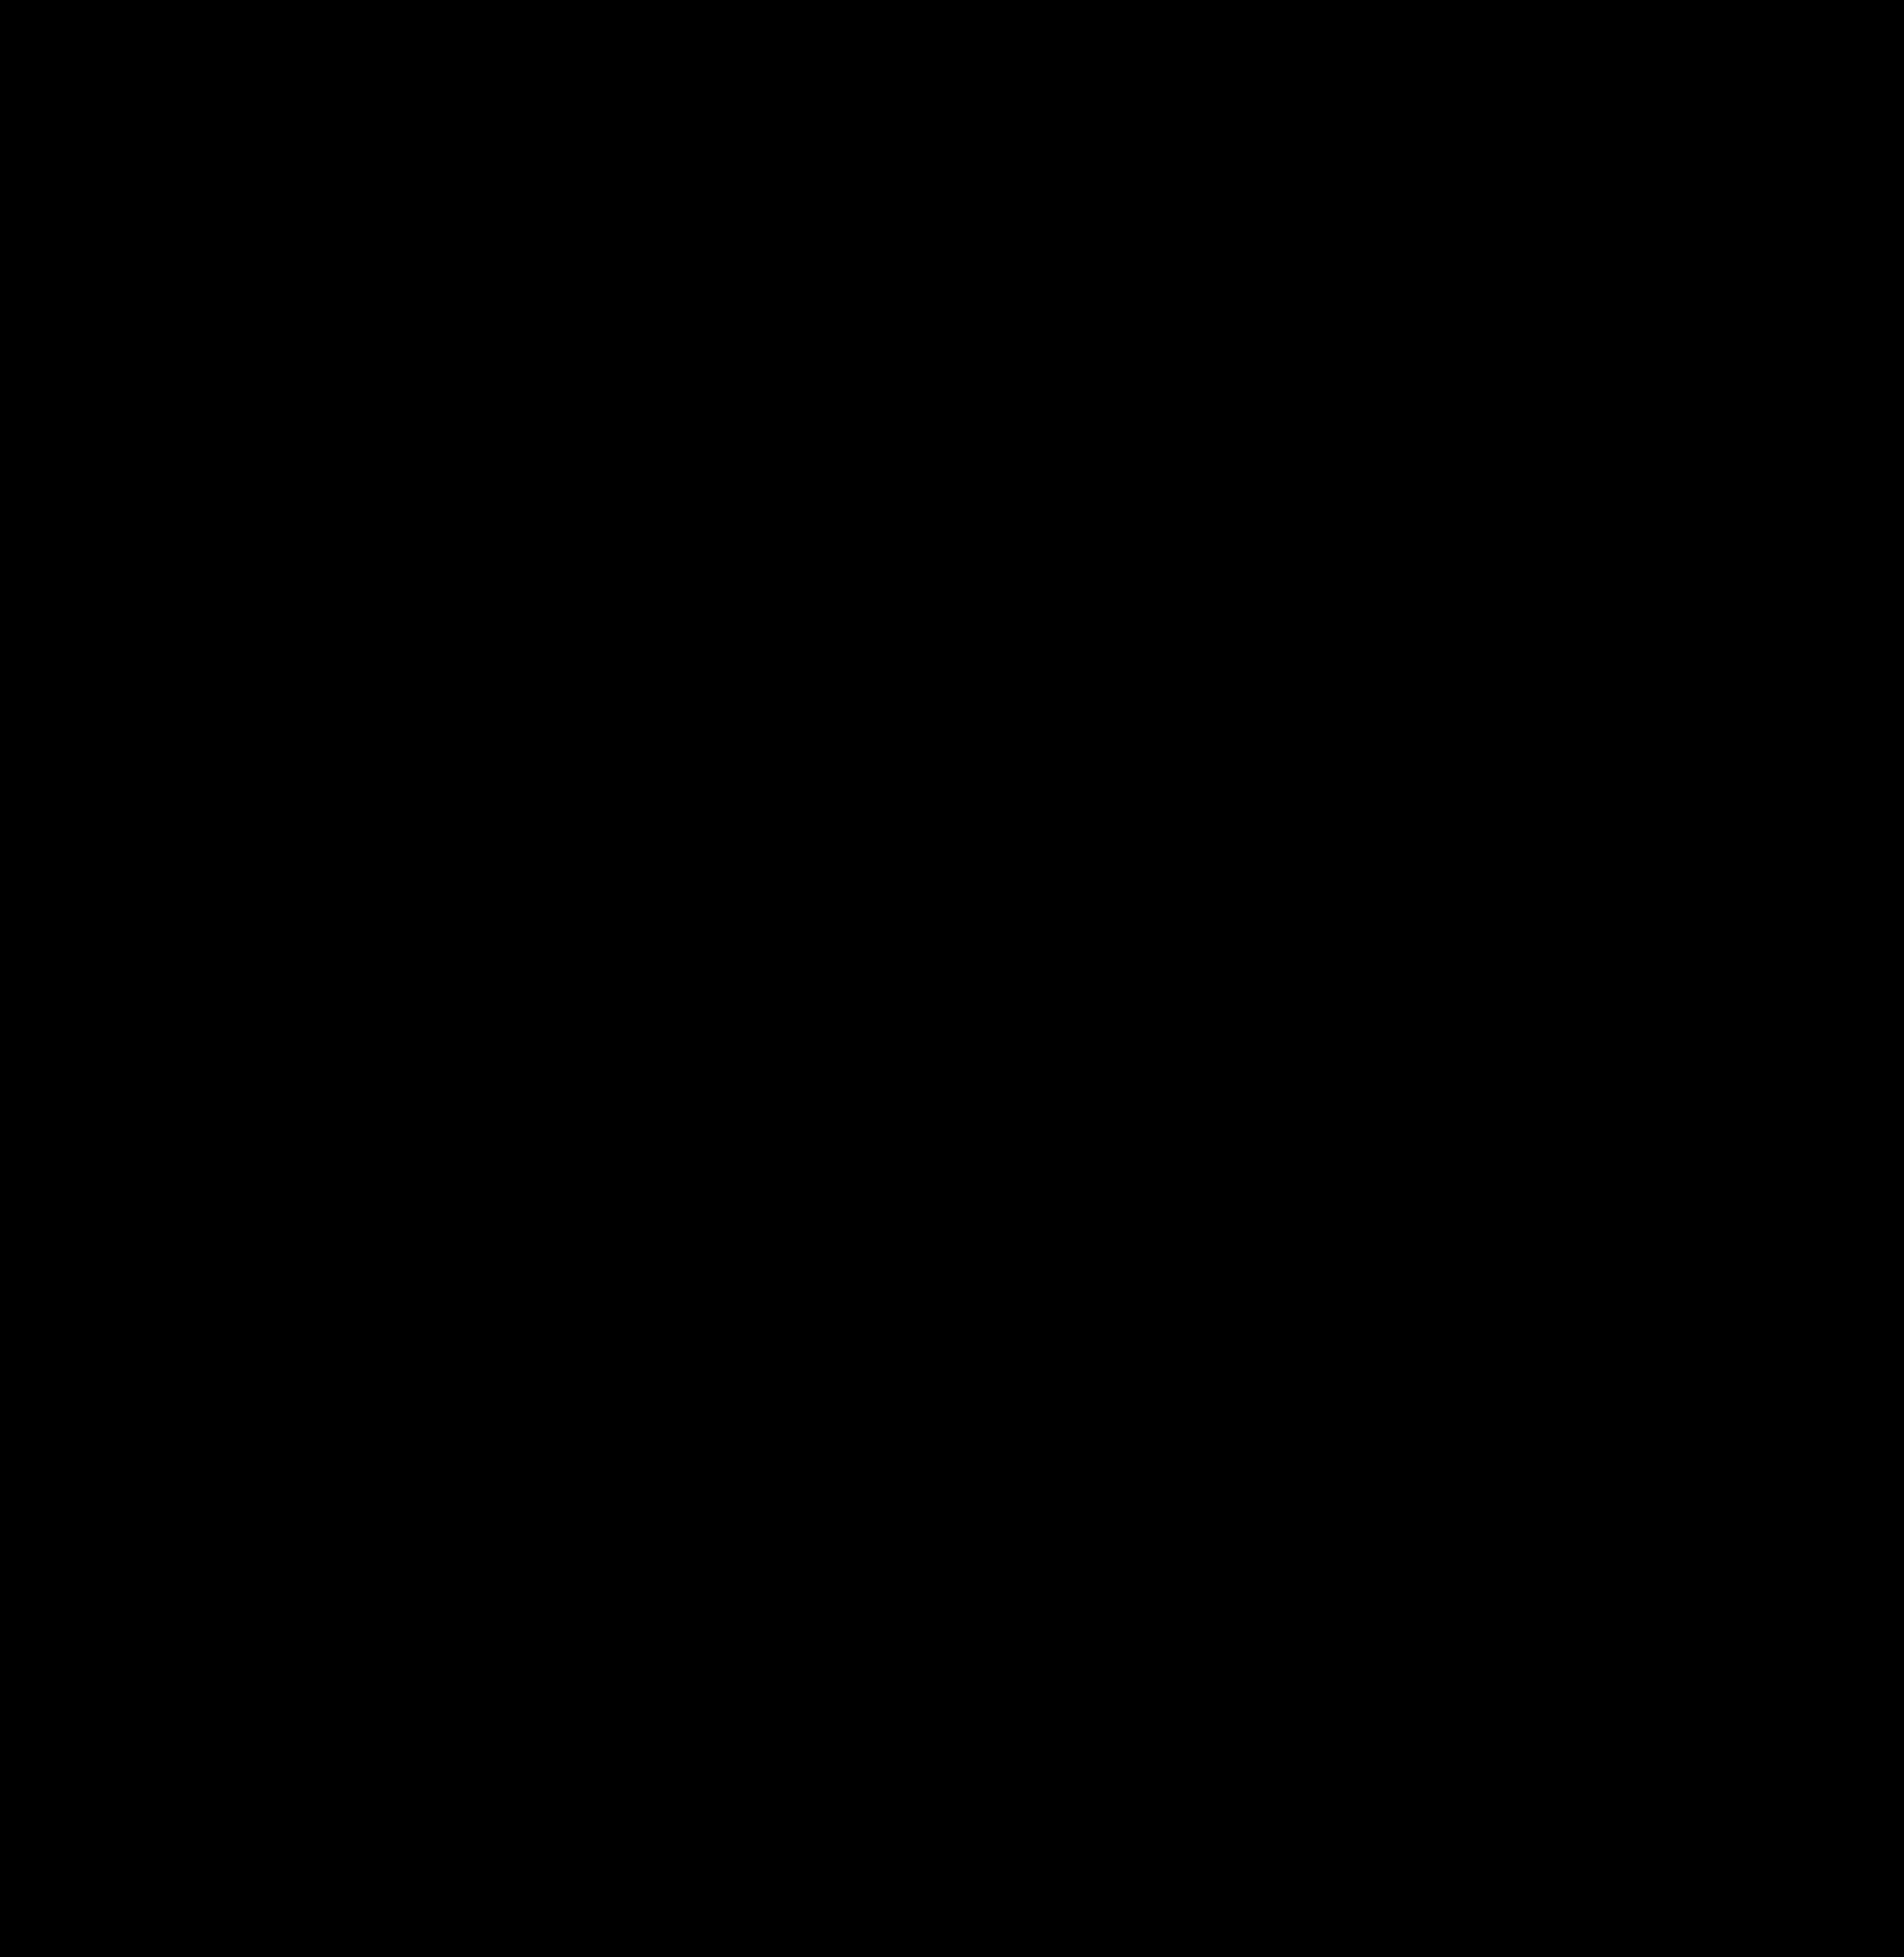 Digital Pen-logo-black.png